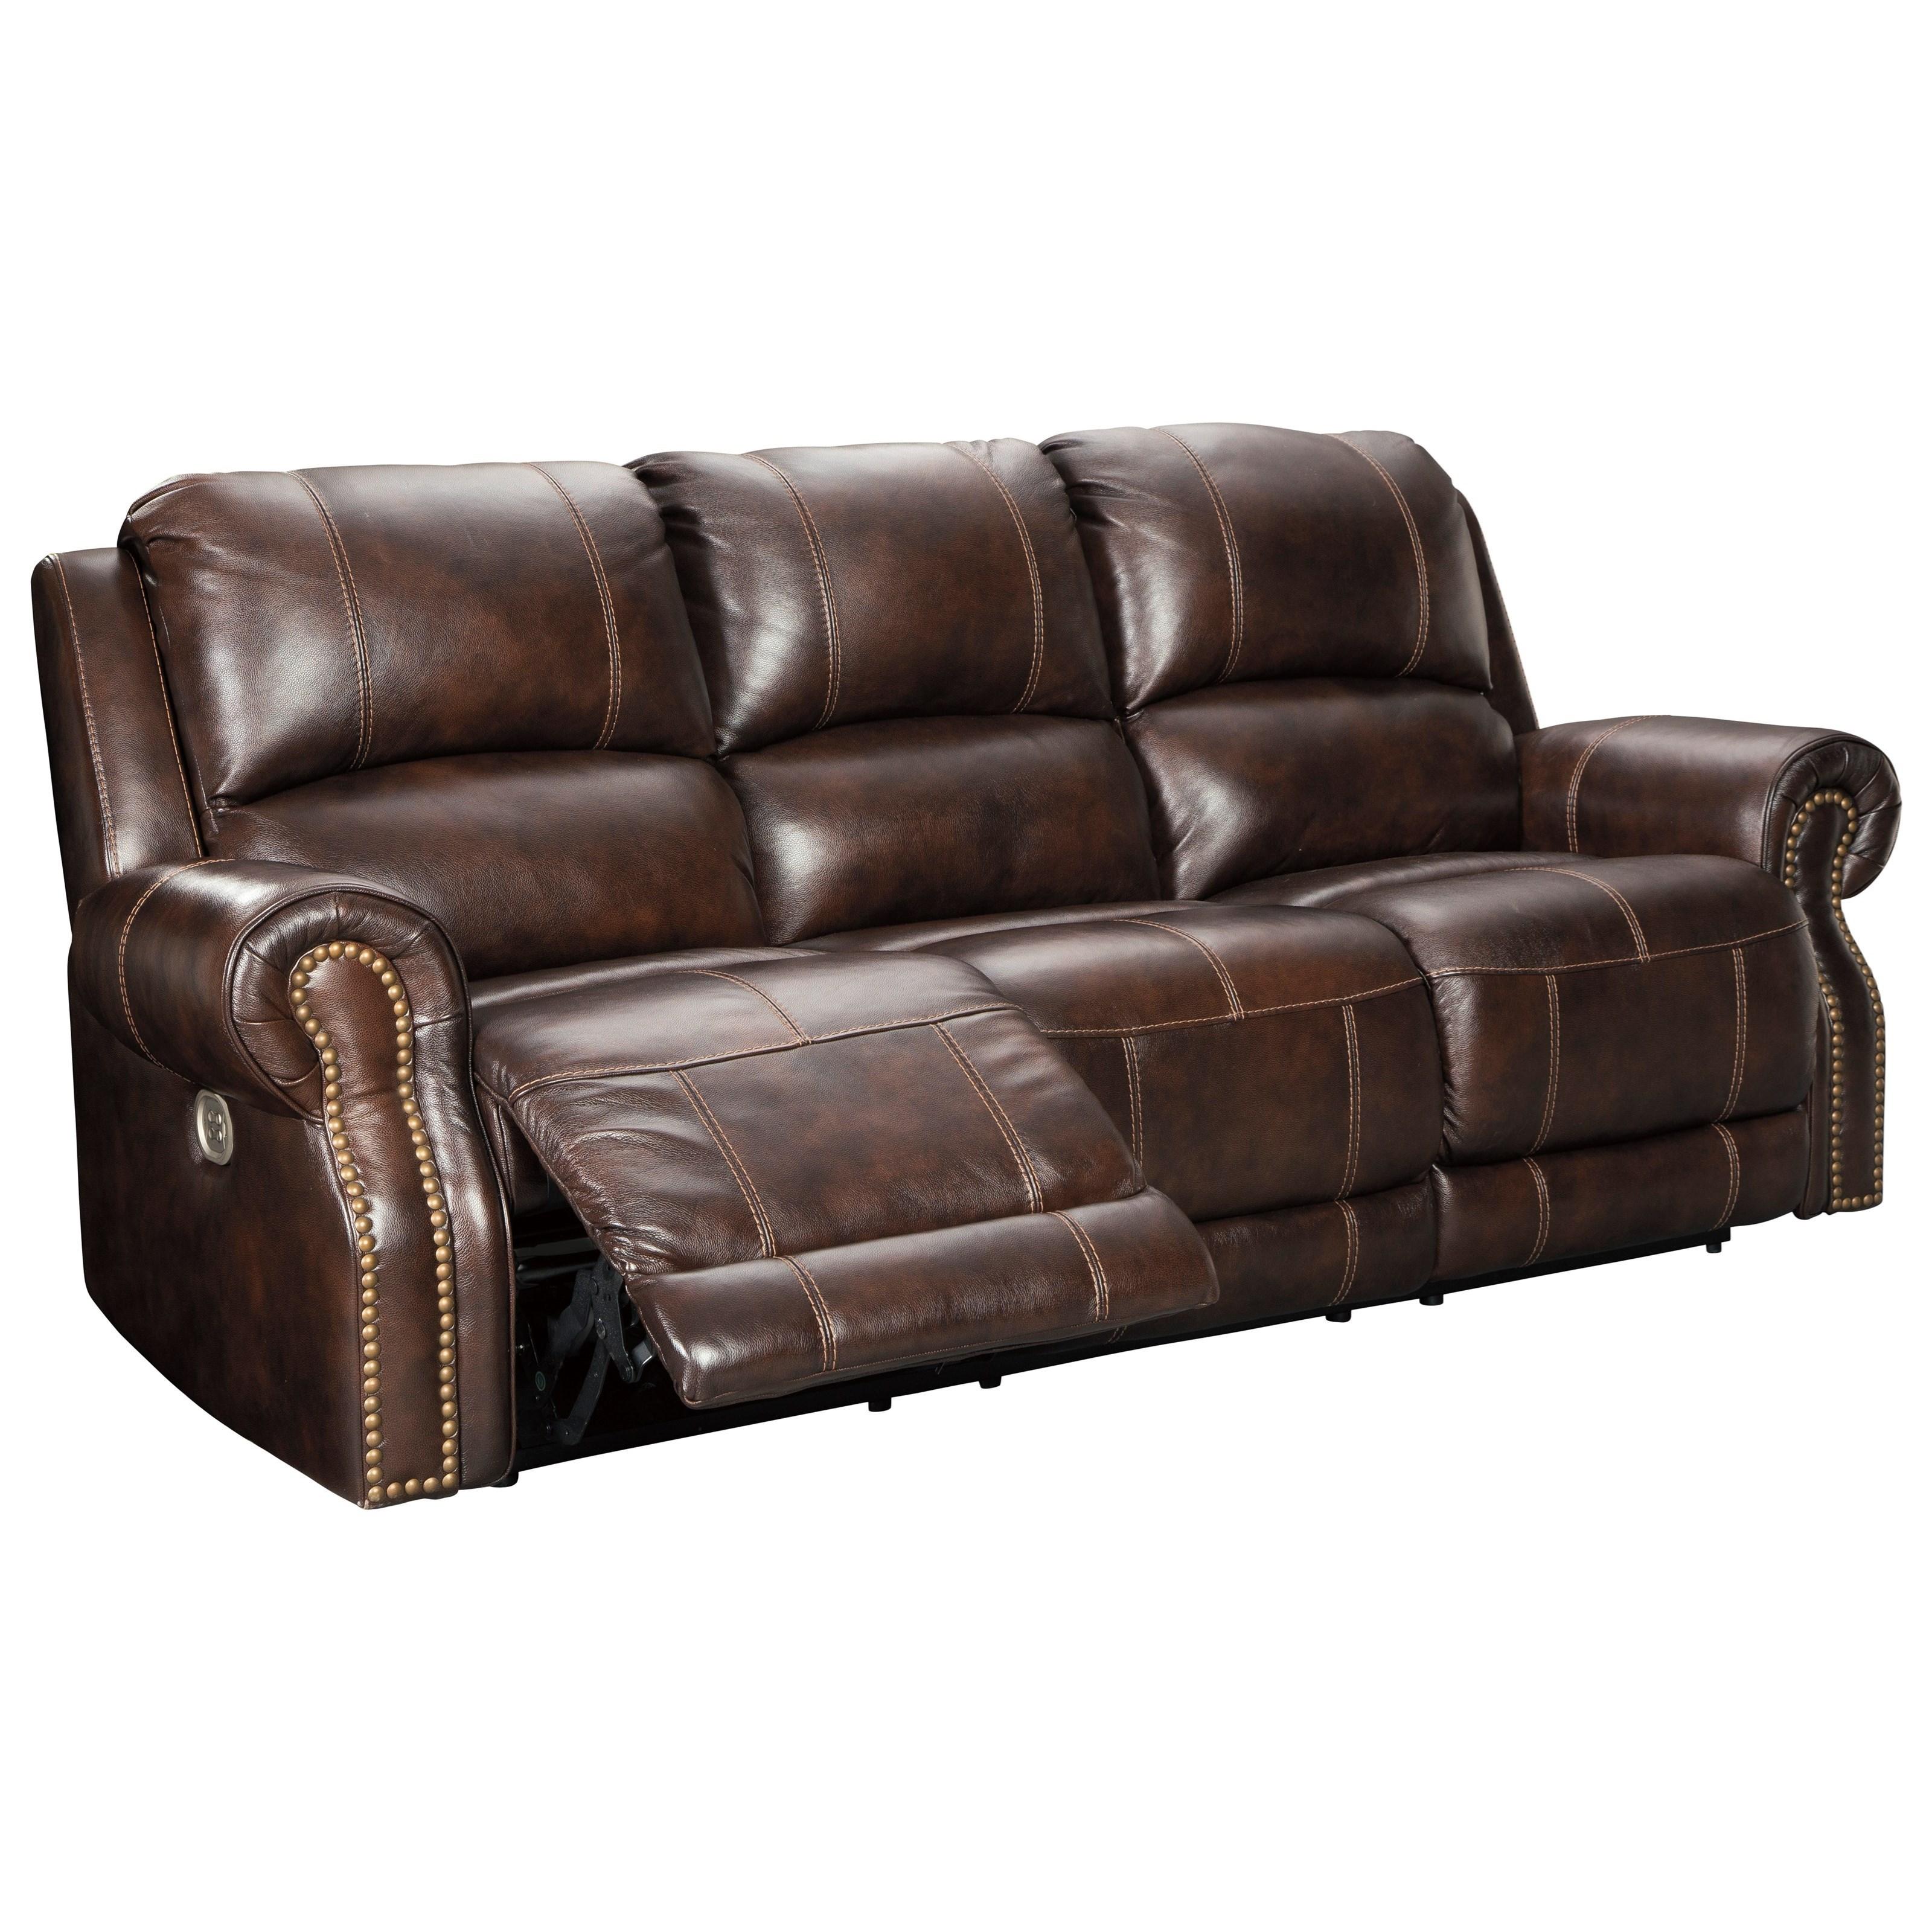 reclining sofa with nailhead trim white family room ashley signature design buncrana u8460415 traditional